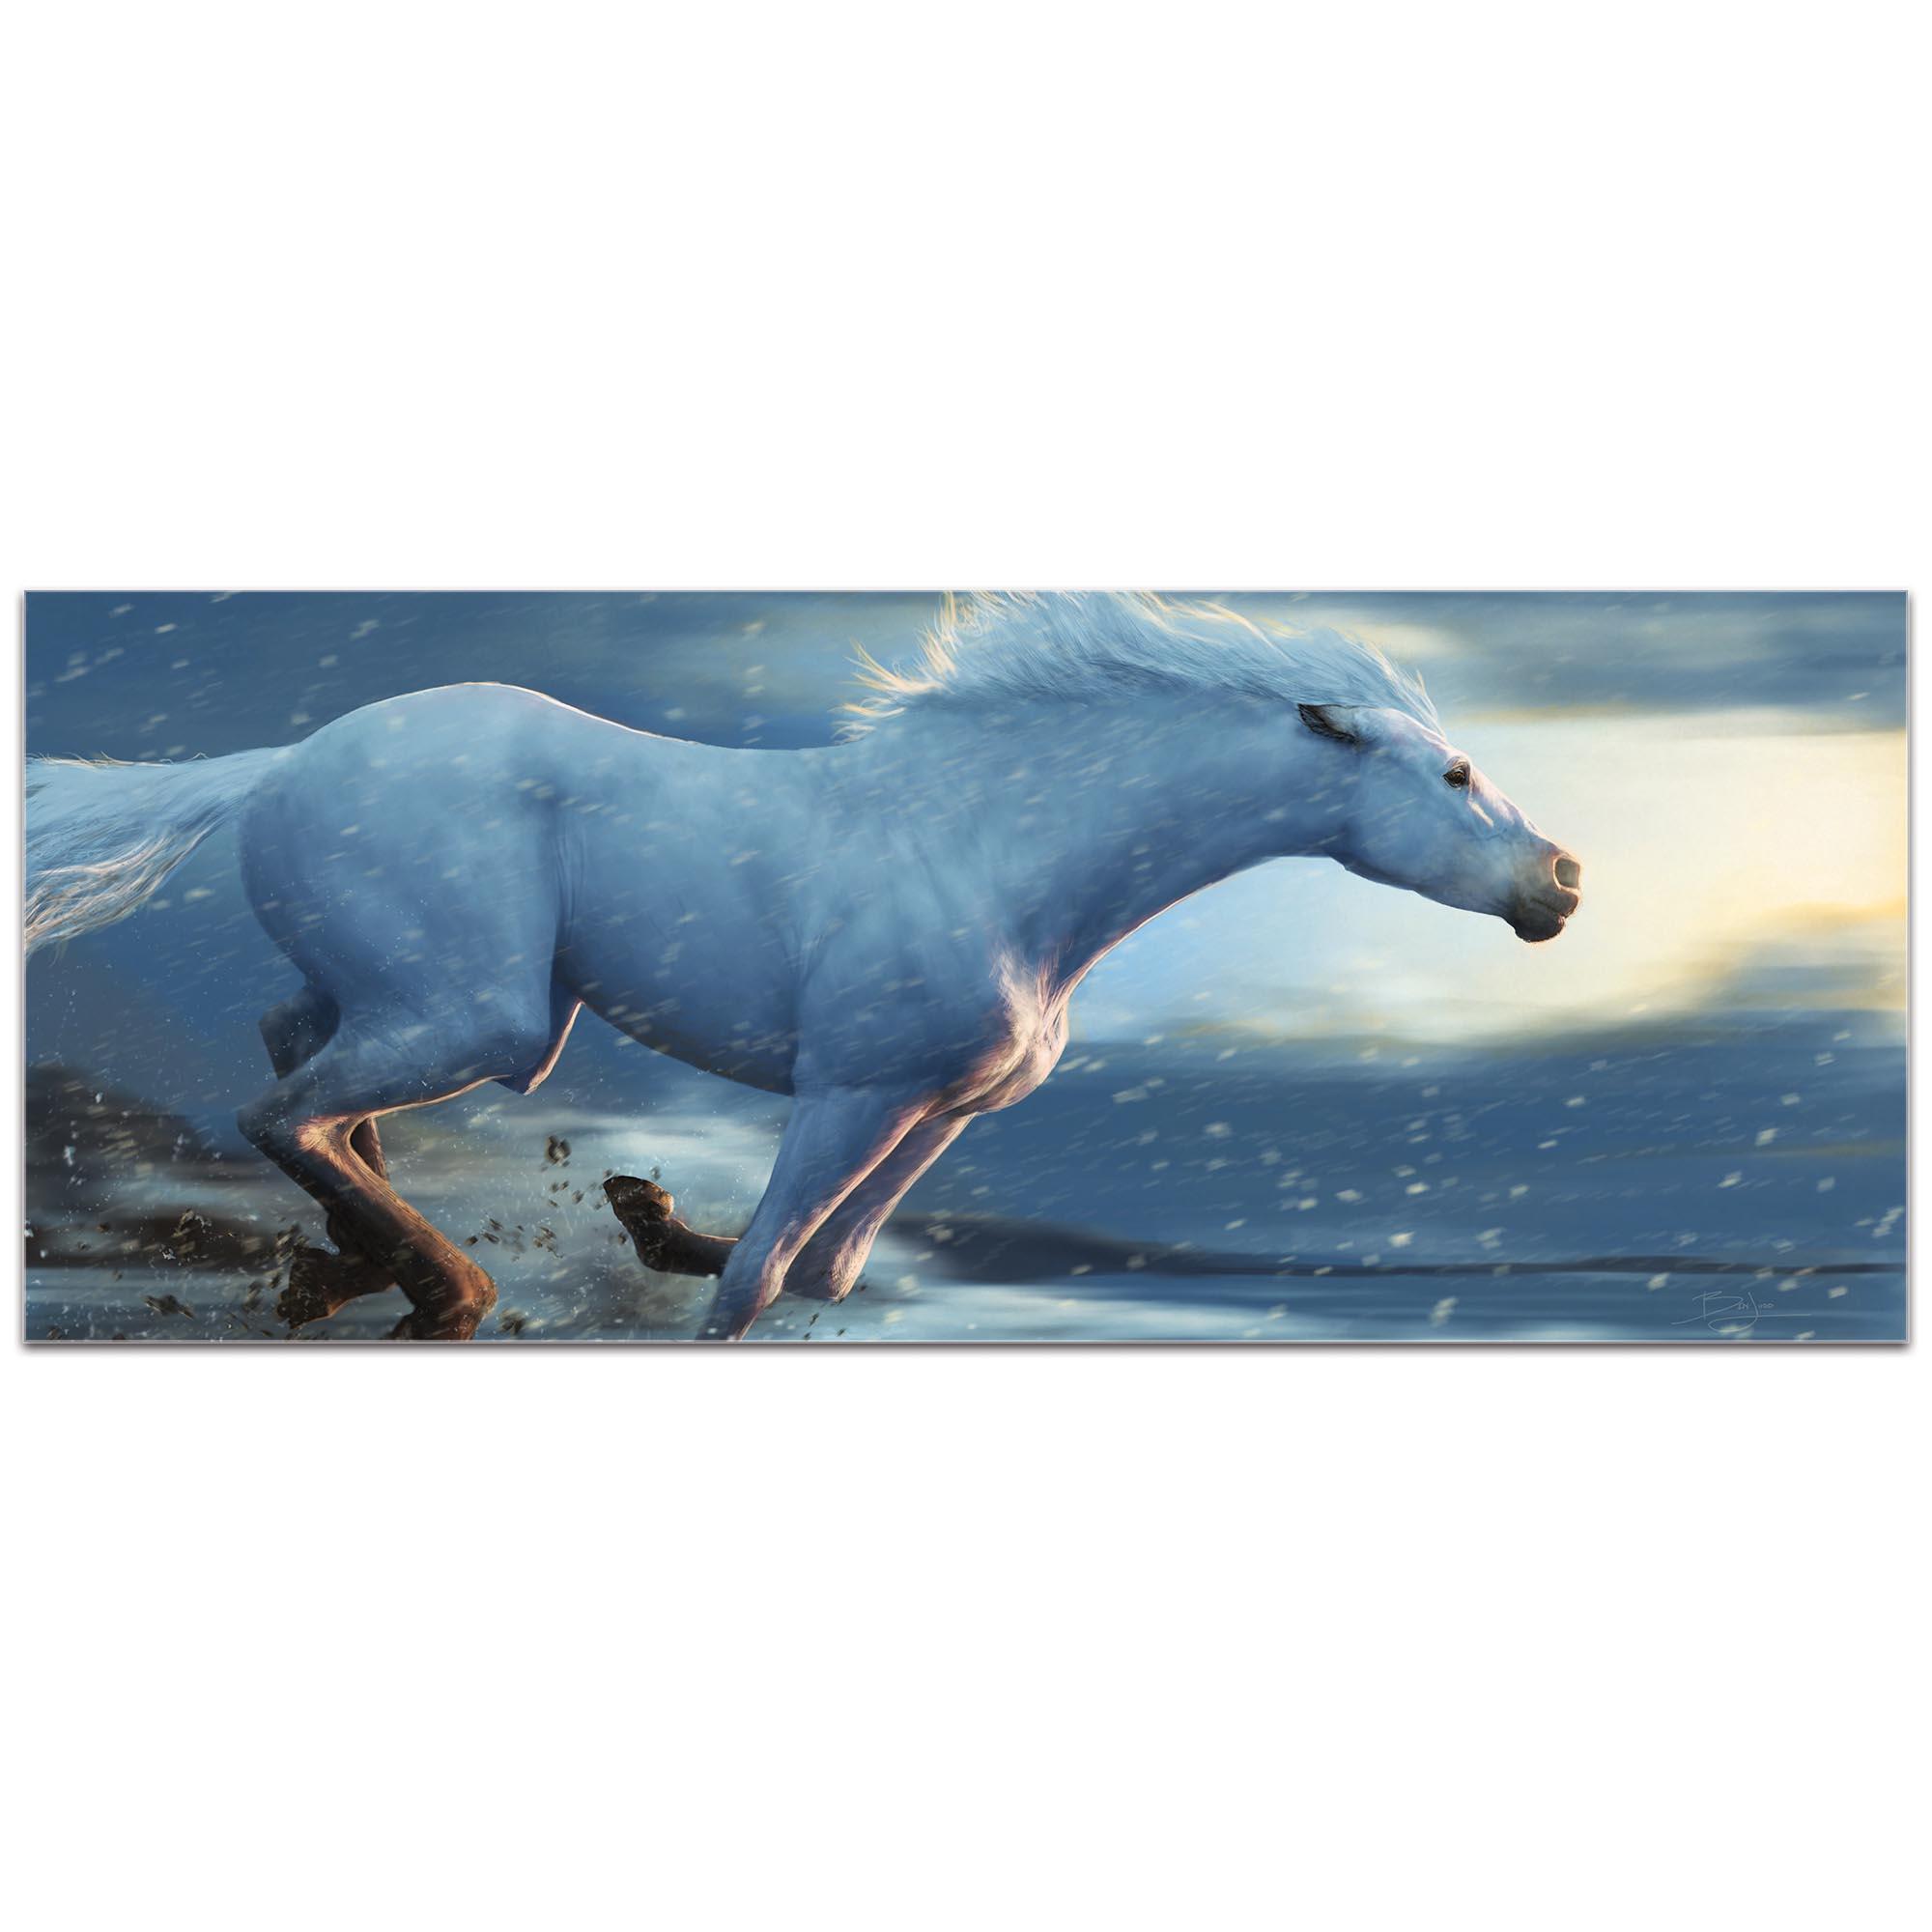 Expressionist Wall Art 'Running Horse' - Wildlife Decor on Metal or Plexiglass - Image 2